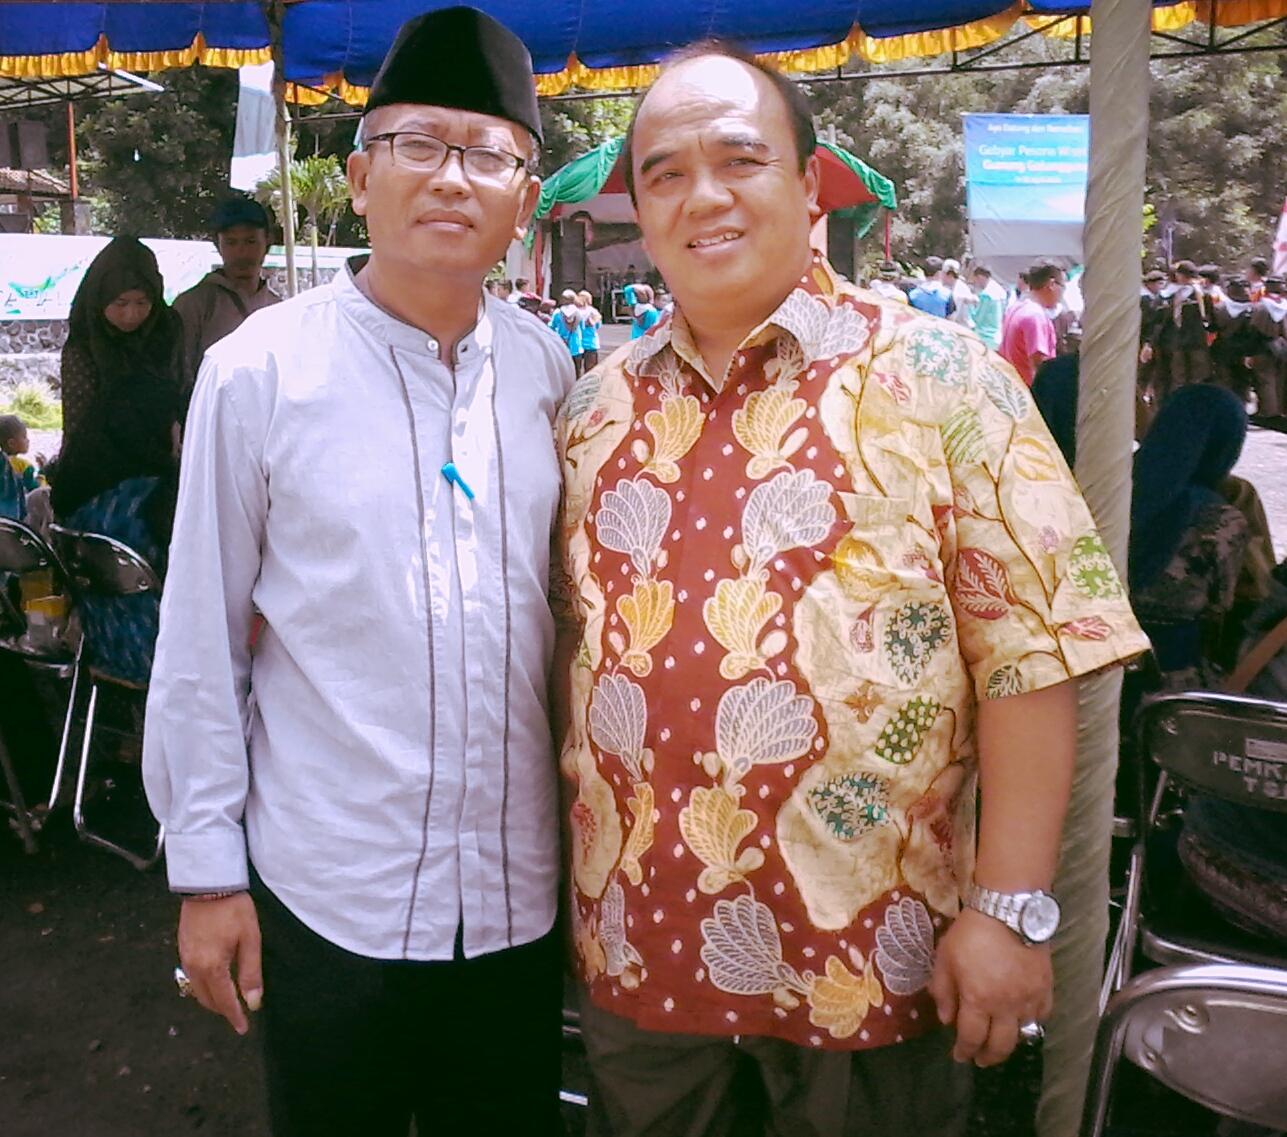 Travelplusindonesia Istiqosah Buka Festival Gebyar Pesona Wisata Gelang Event Konser Running Air Kepala Dinas Pariwisata Kabupaten Tasikmalaya Nazmudin Aziz Kepada Mengatakan Gunung Galunggung Ini